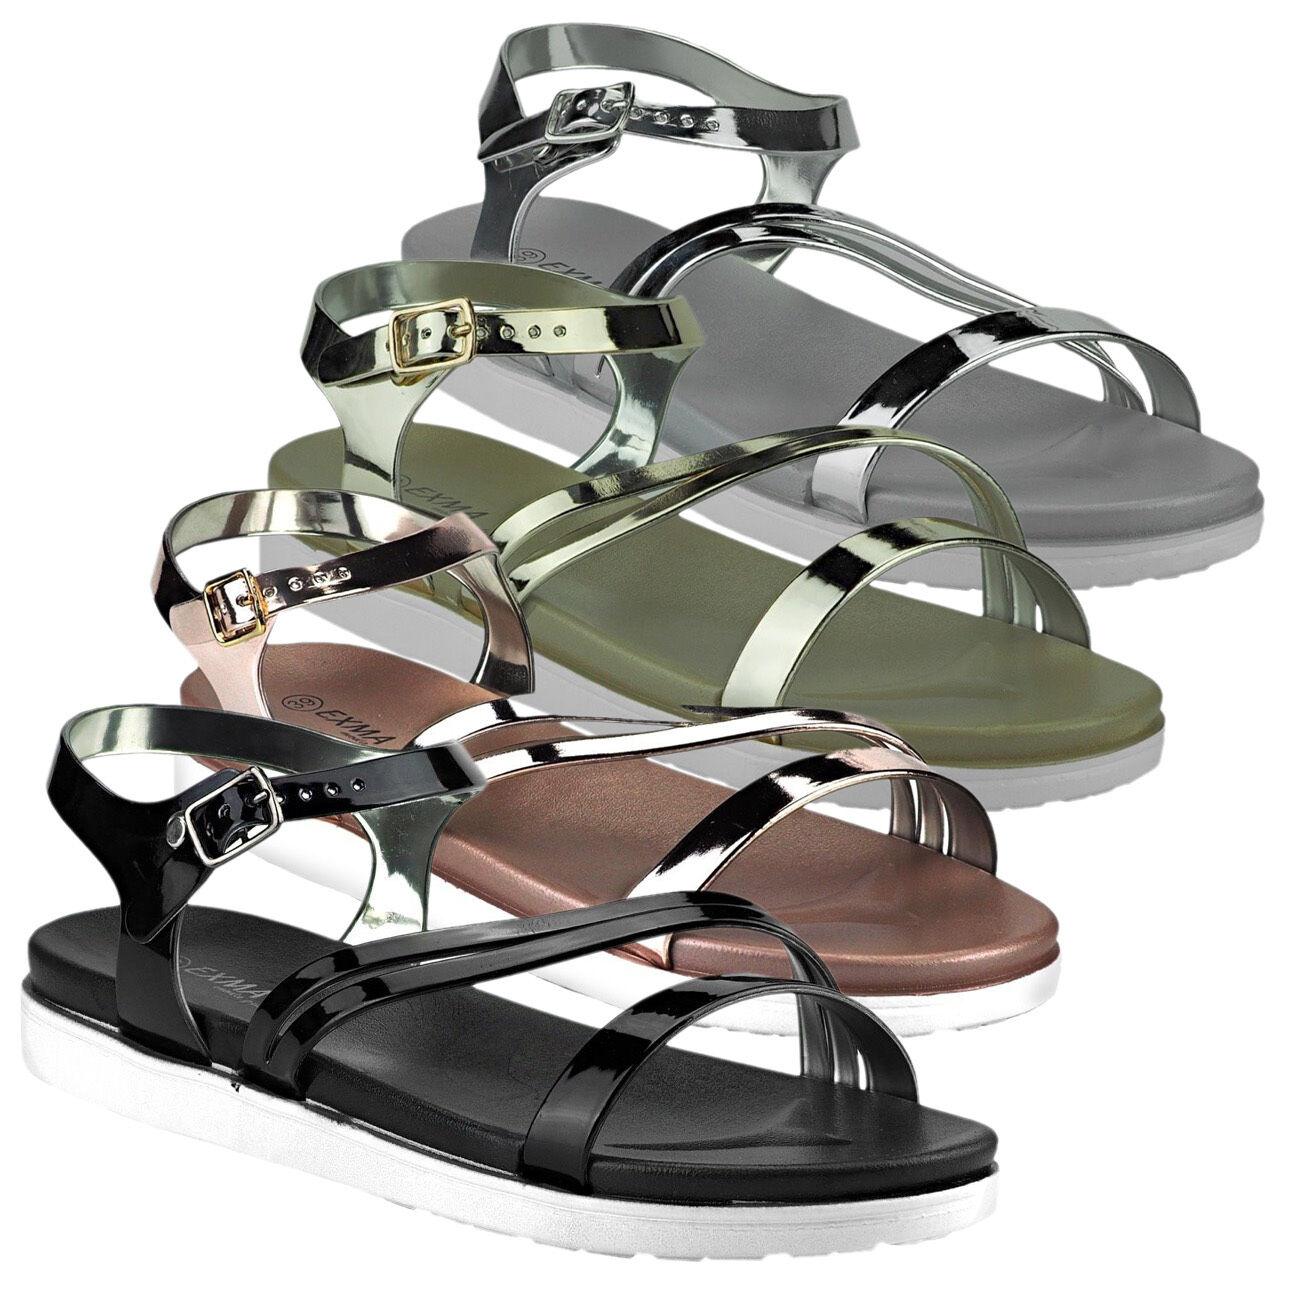 20033 FRESCO damensandalett<wbr/>en sandali scarpe donna metallizzato Vernice